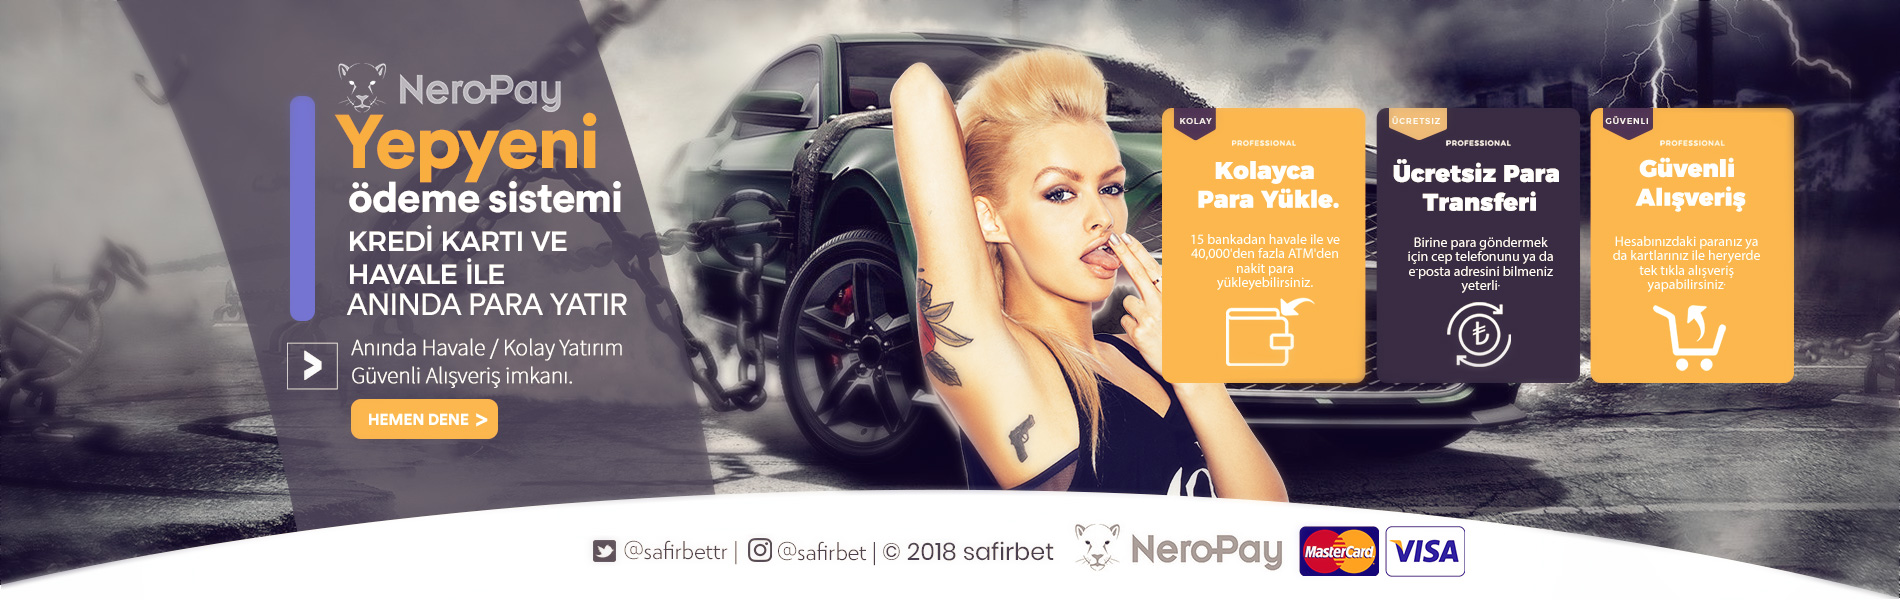 nero-pay